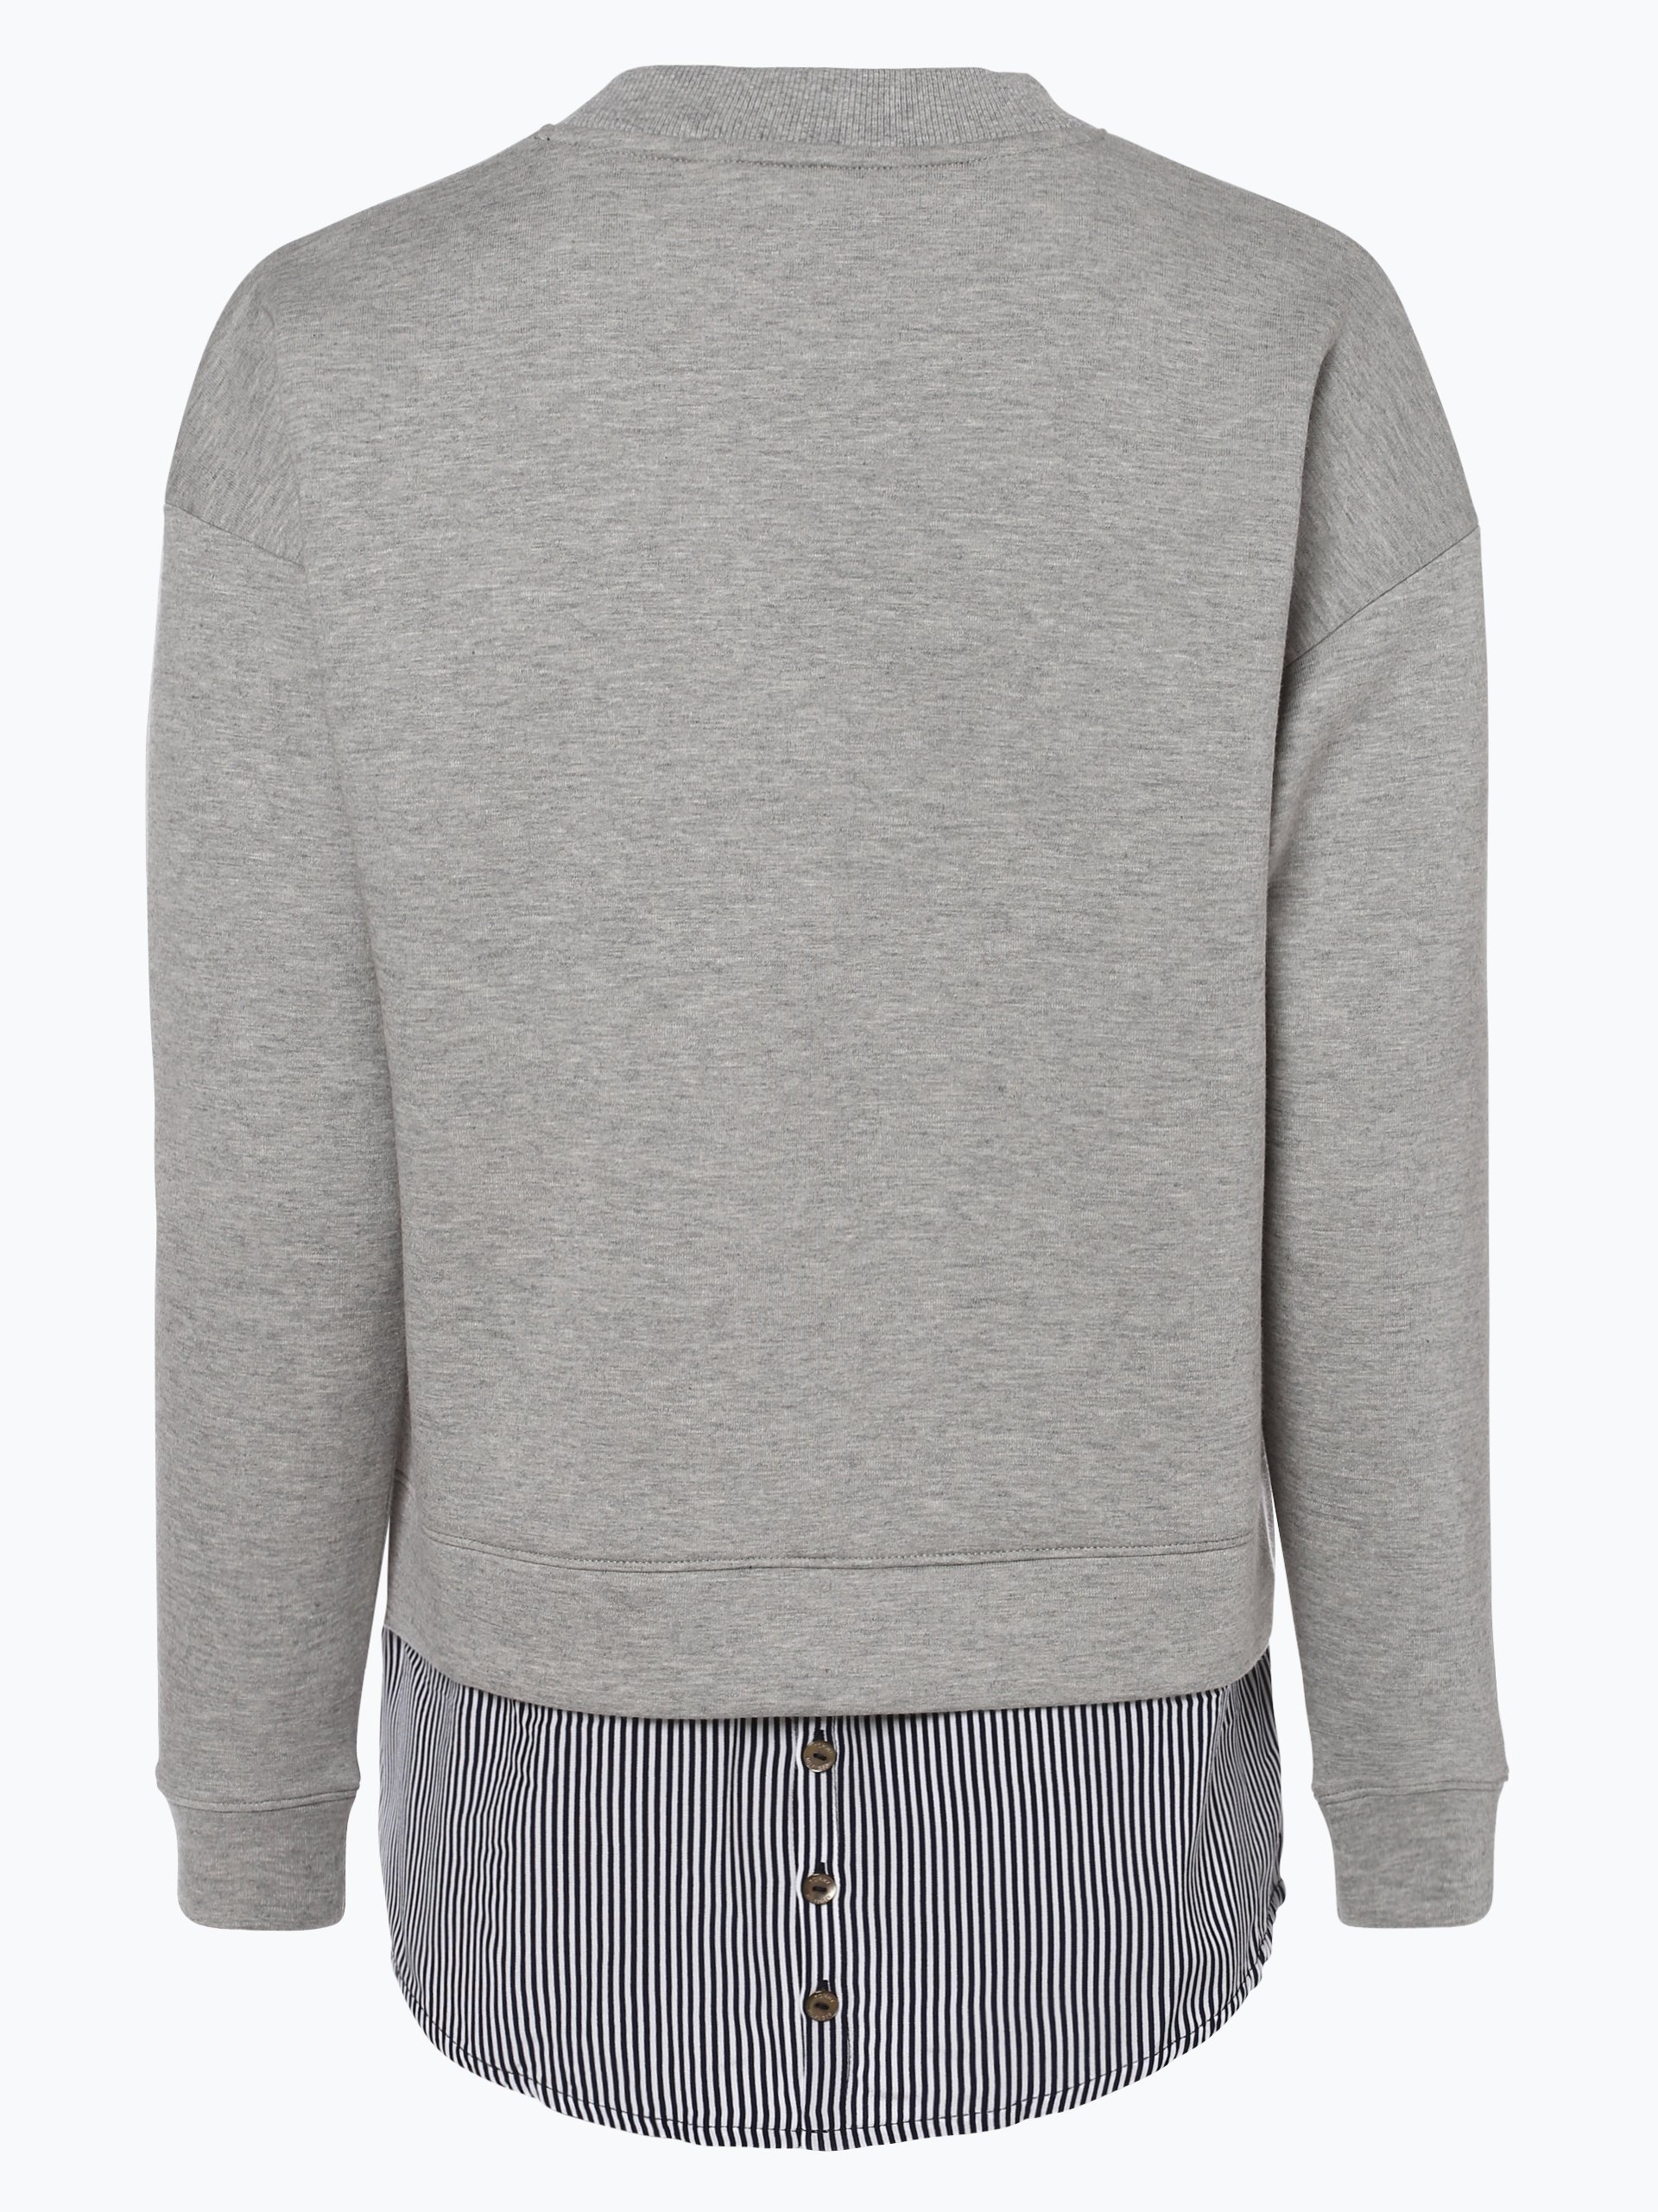 tommy hilfiger damen sweatshirt cedrik grau gestreift. Black Bedroom Furniture Sets. Home Design Ideas